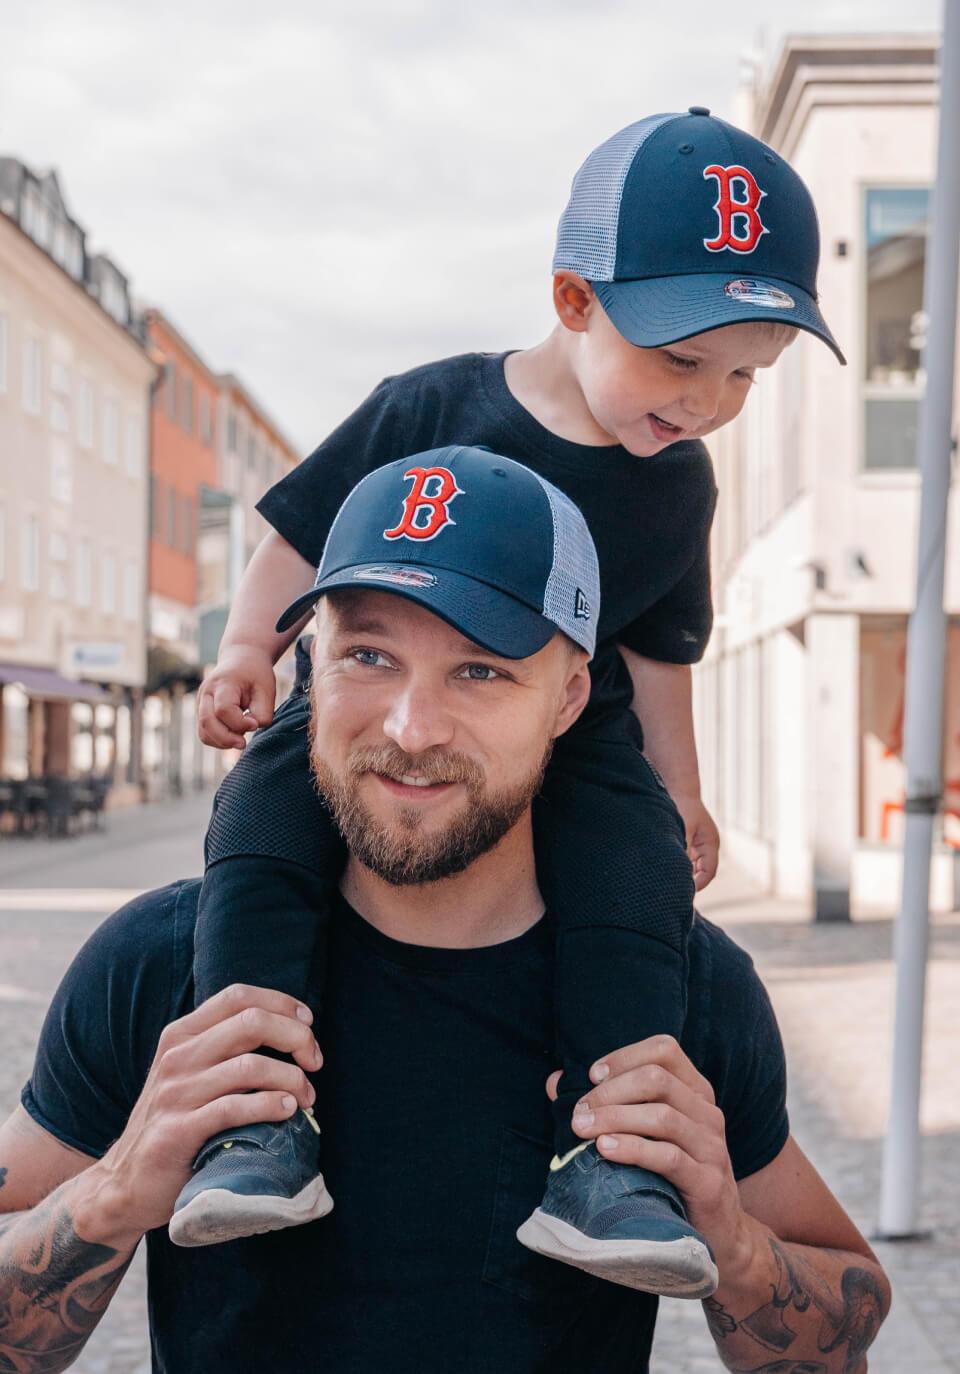 Hatstore x New Era | The Big Summer Drop 2020 | Kids Sizes